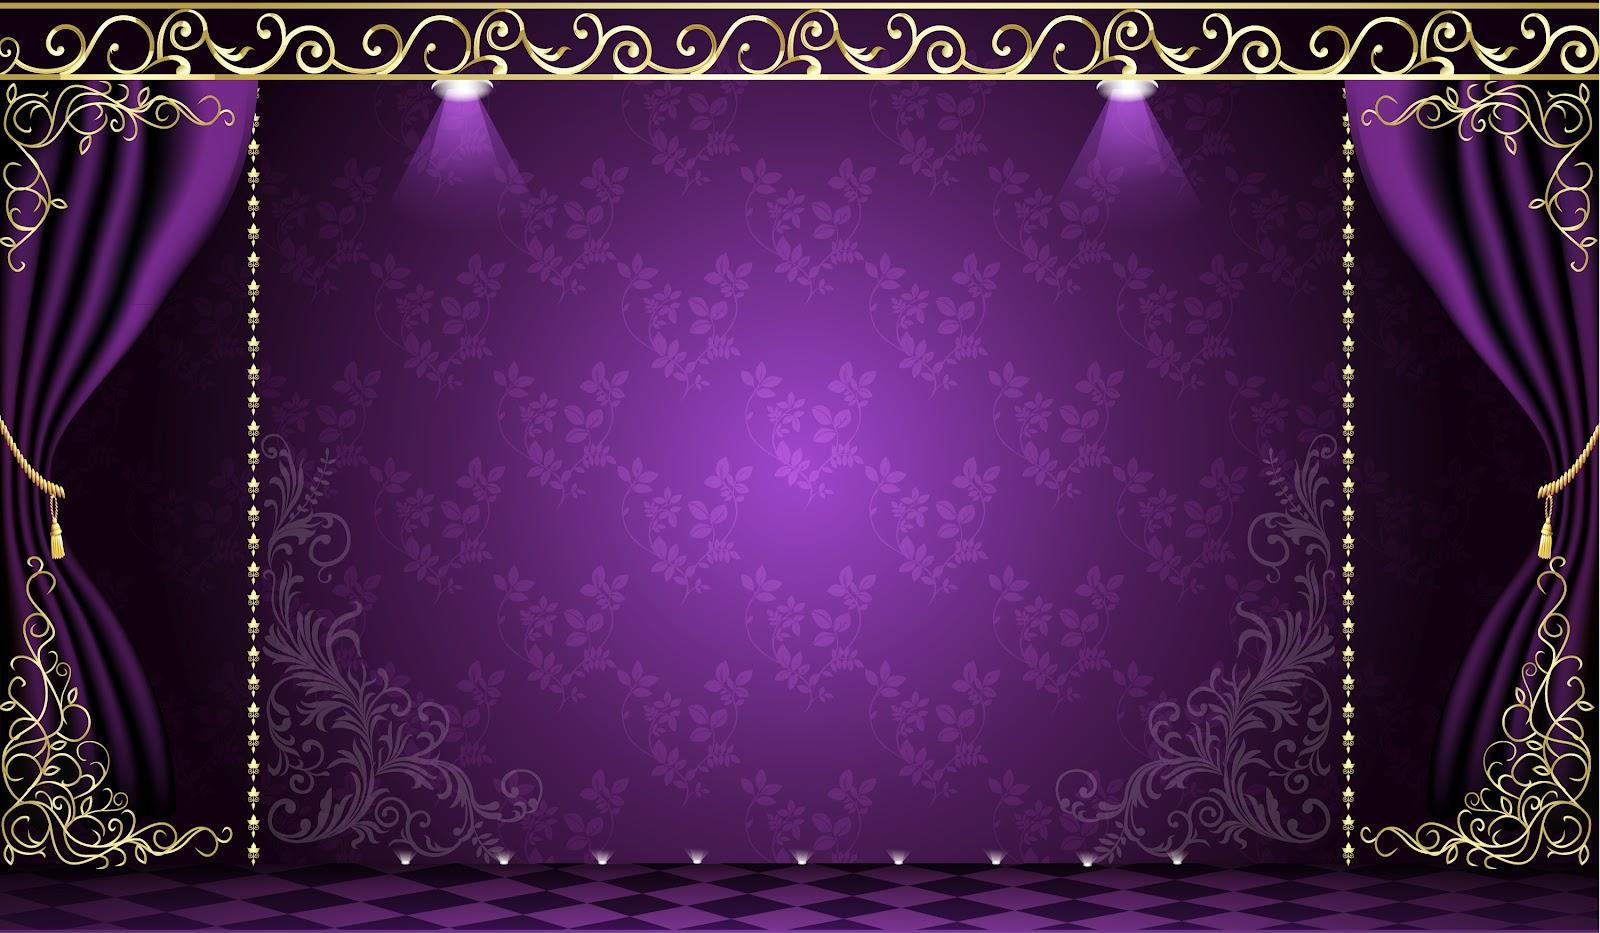 royal purple wallpaper wallpapersafari. Black Bedroom Furniture Sets. Home Design Ideas